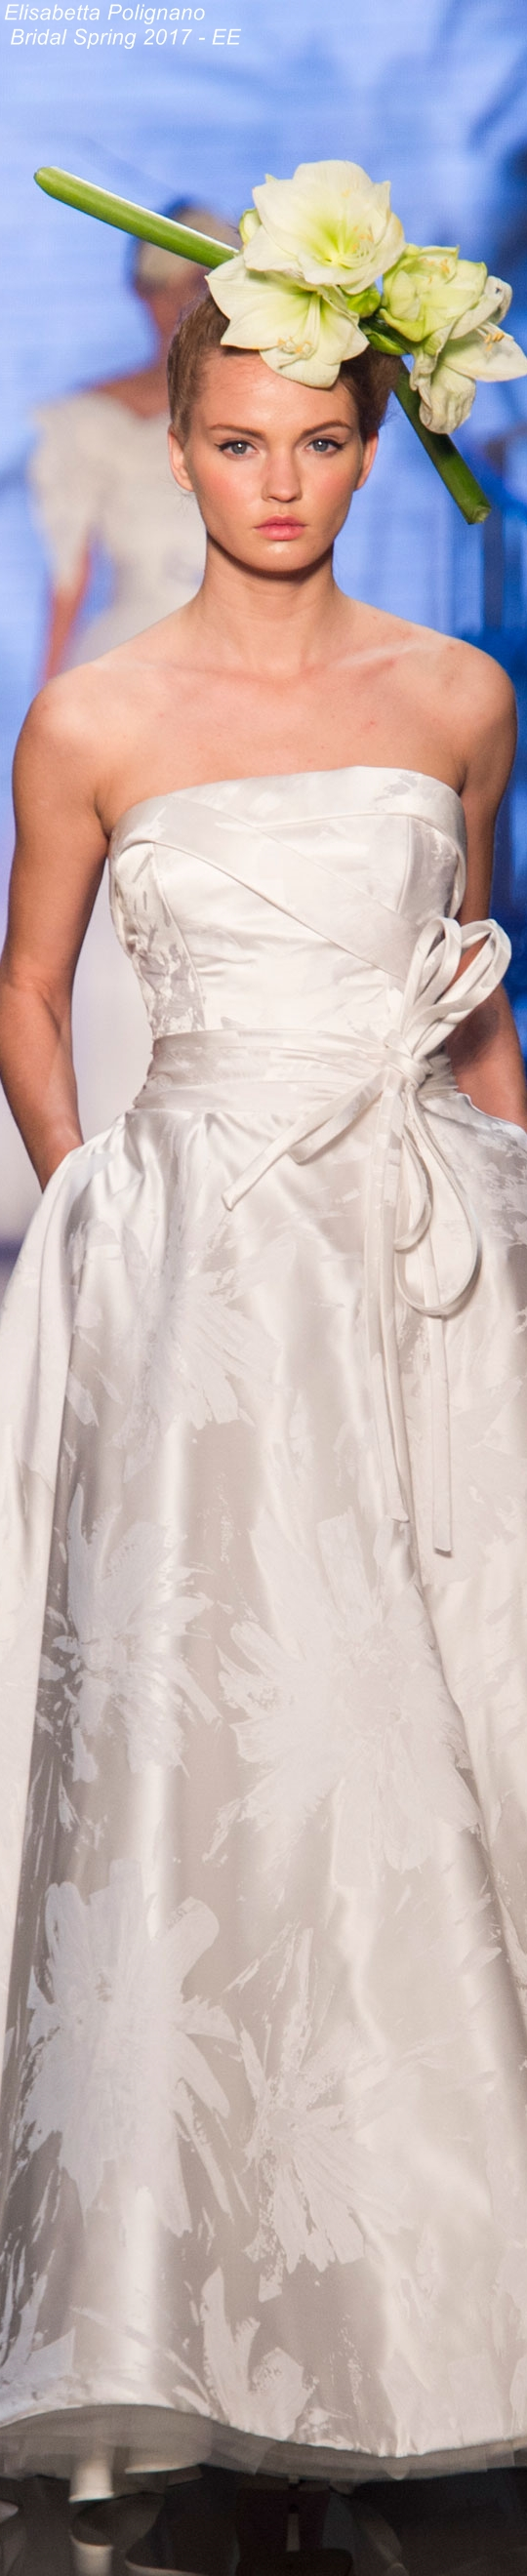 Elisabetta Polignano Bridal Spring 2017 - E | Fashion - Bridal 2017 ...